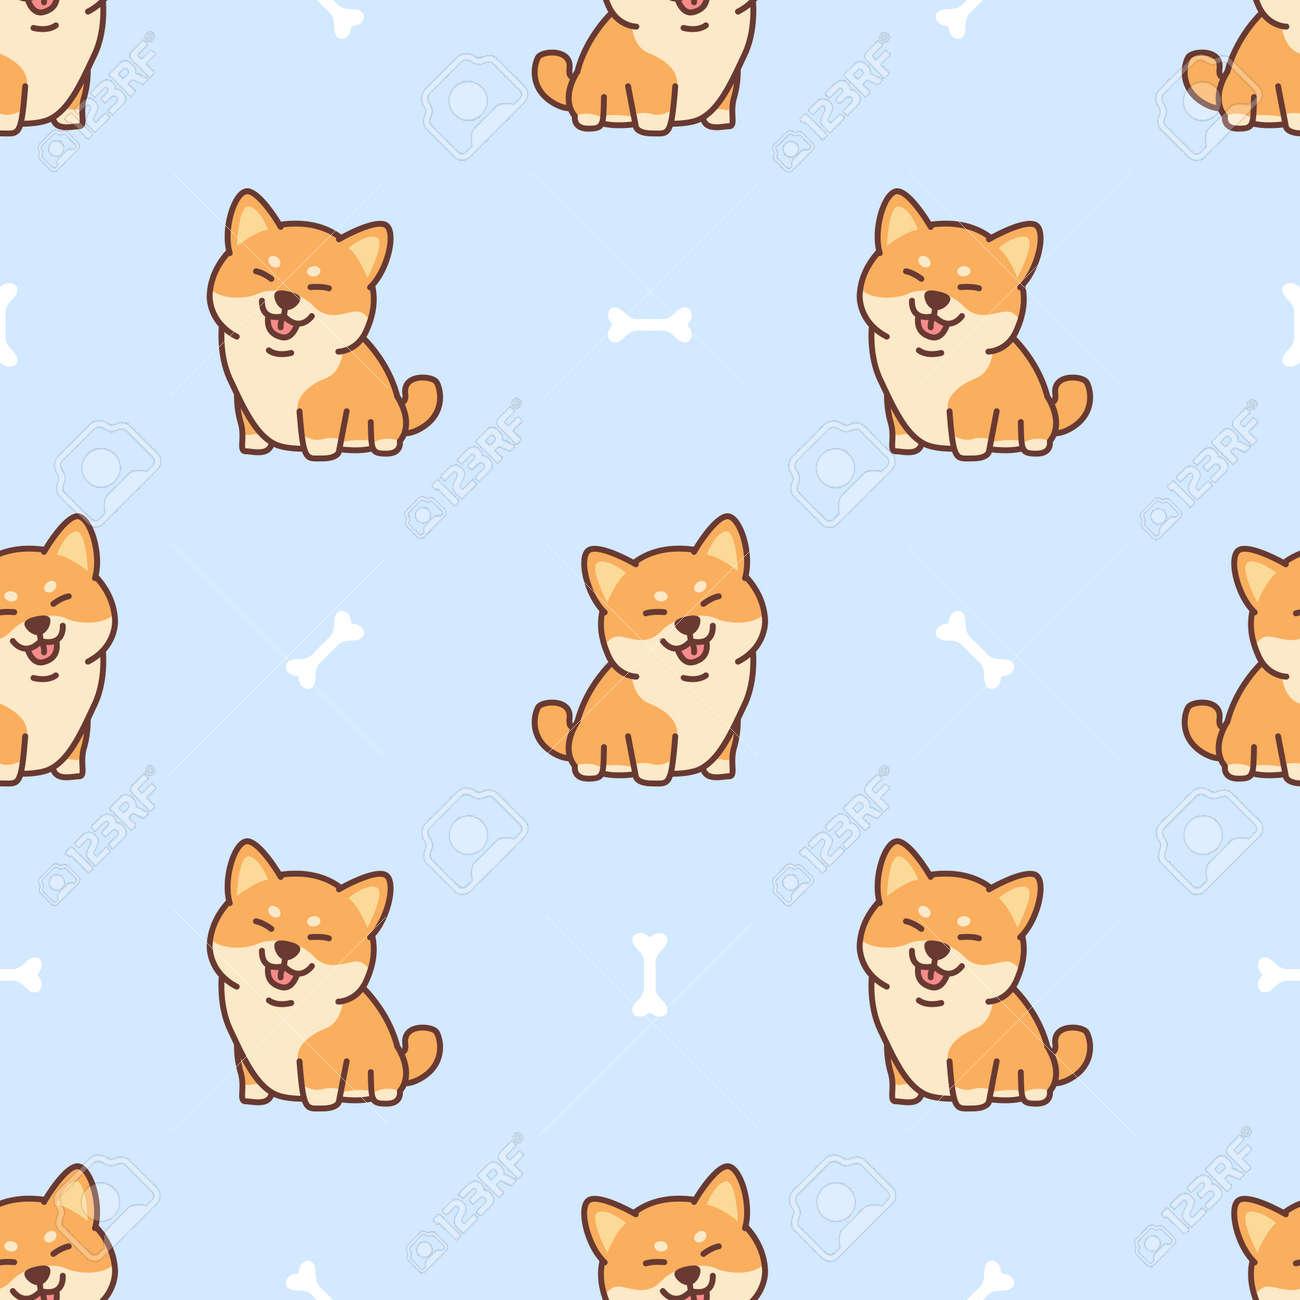 Cute shiba inu dog cartoon seamless pattern, vector illustration - 164044981